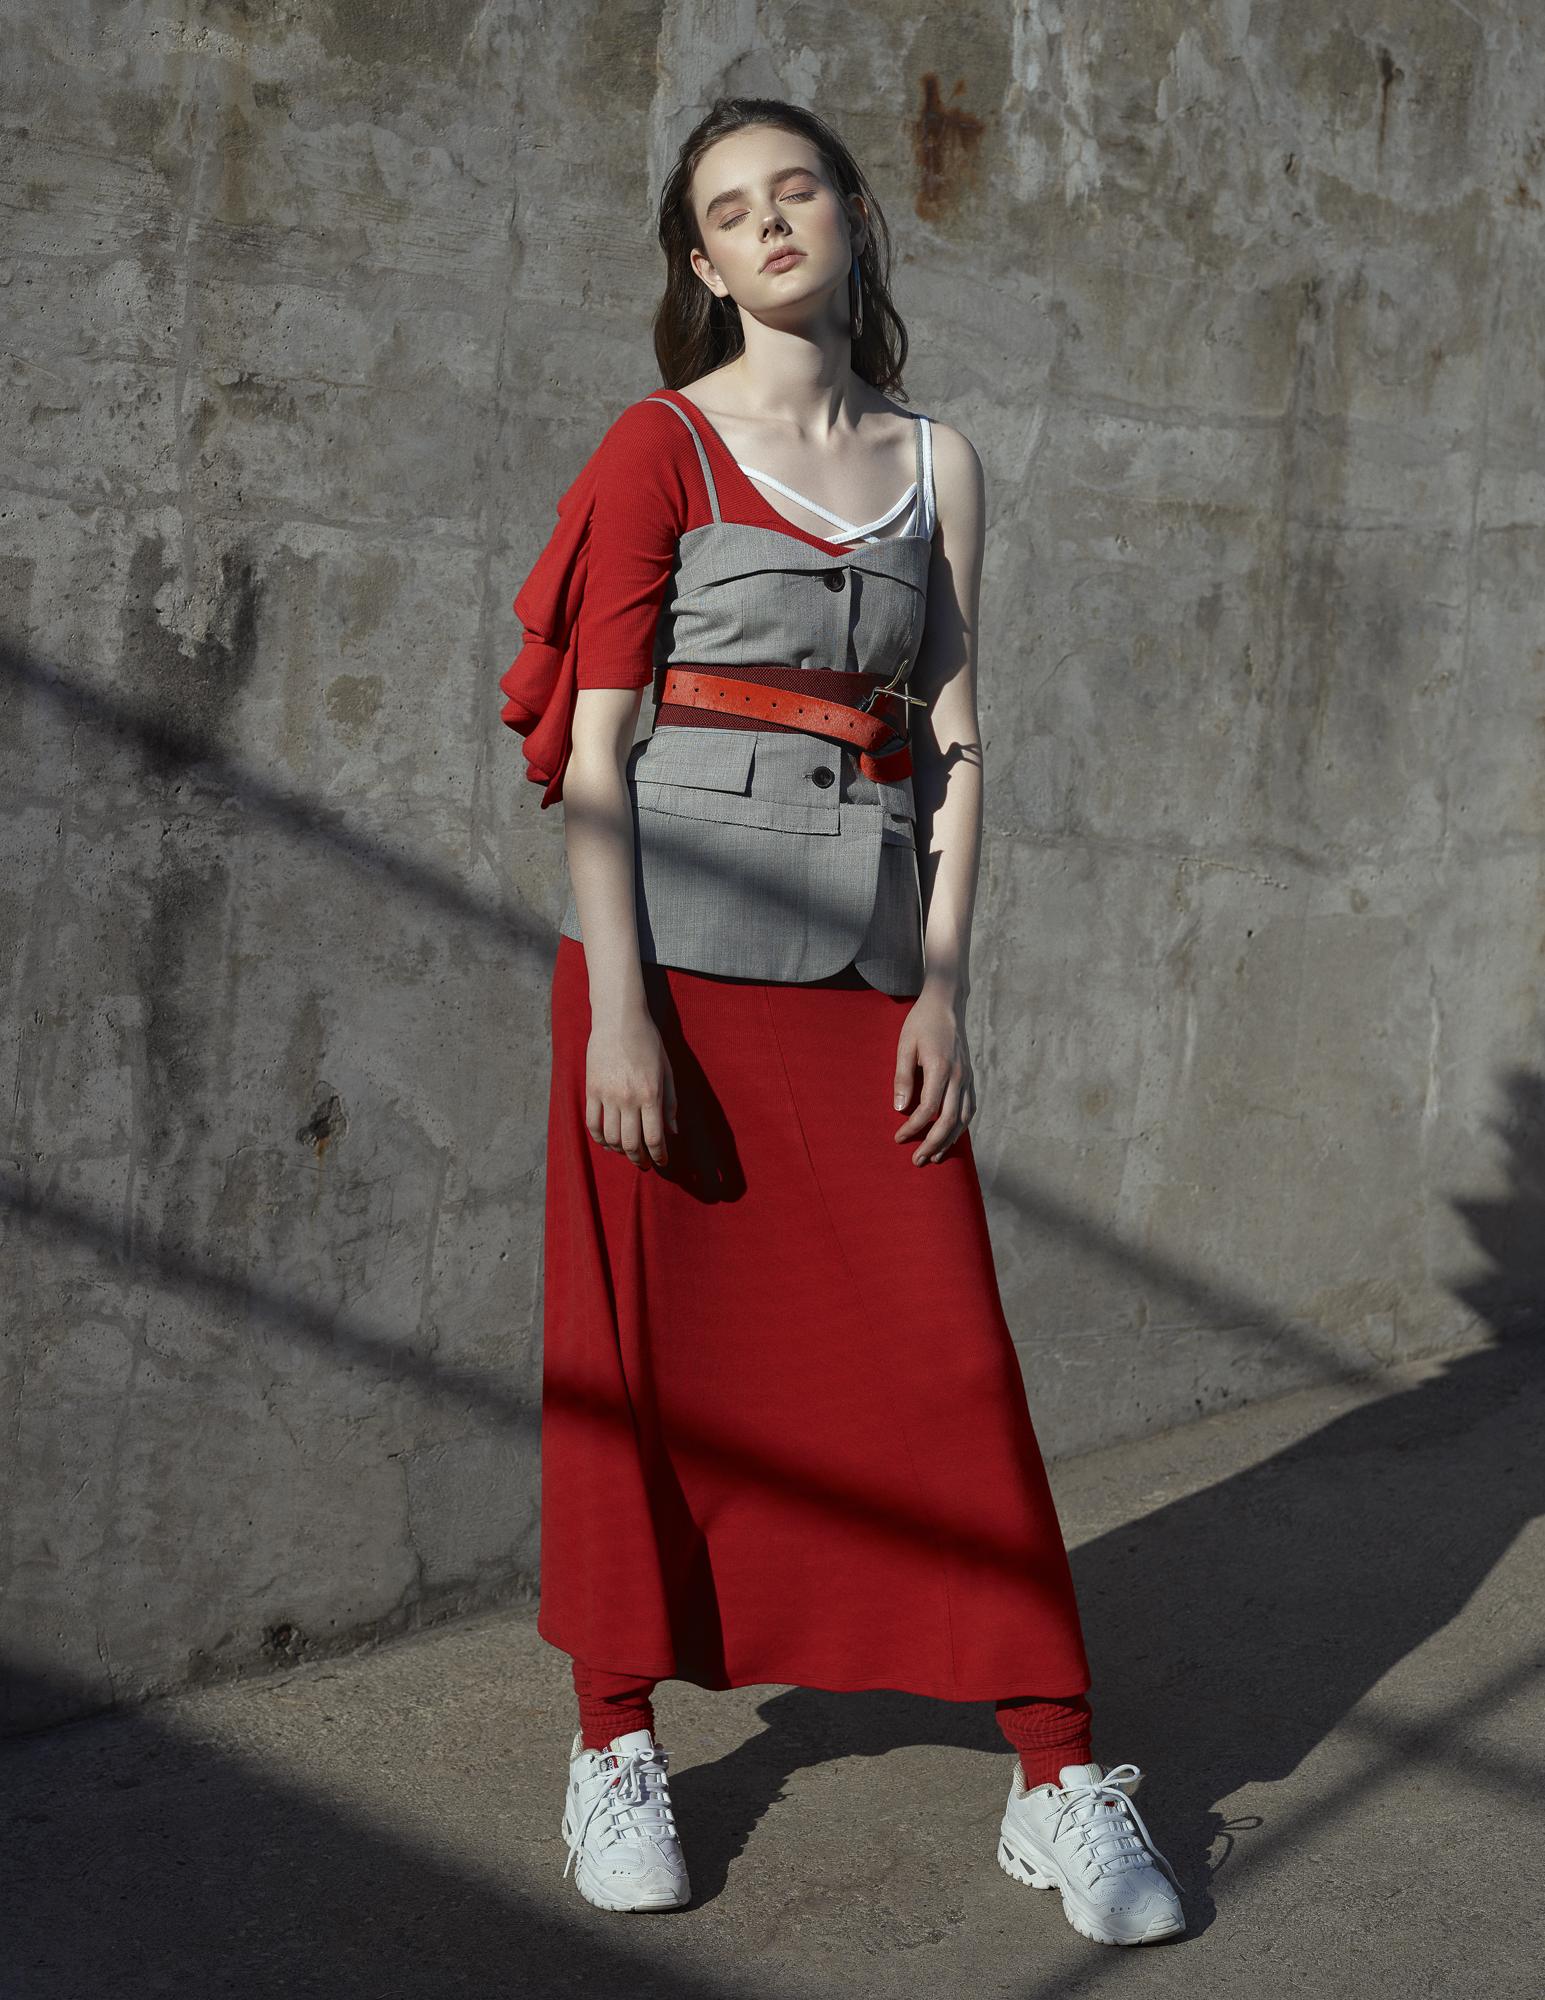 Toronto Fashion Model Portrait Photographer Headshots